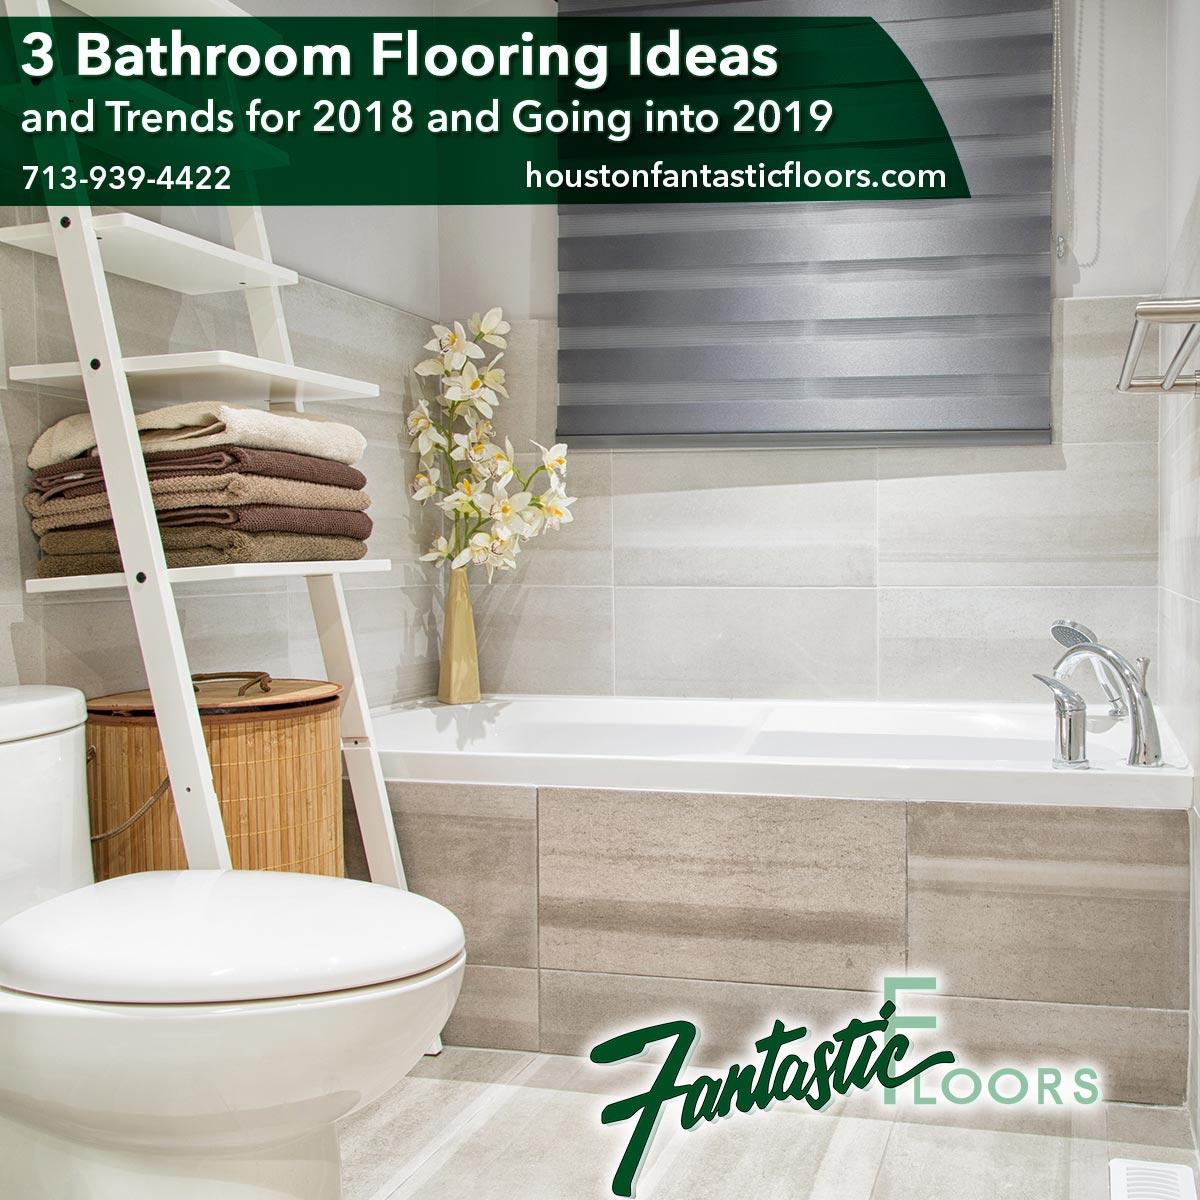 Fantastic Floors, Inc. - 3 Bathroom Flooring Ideas and Trends for ...